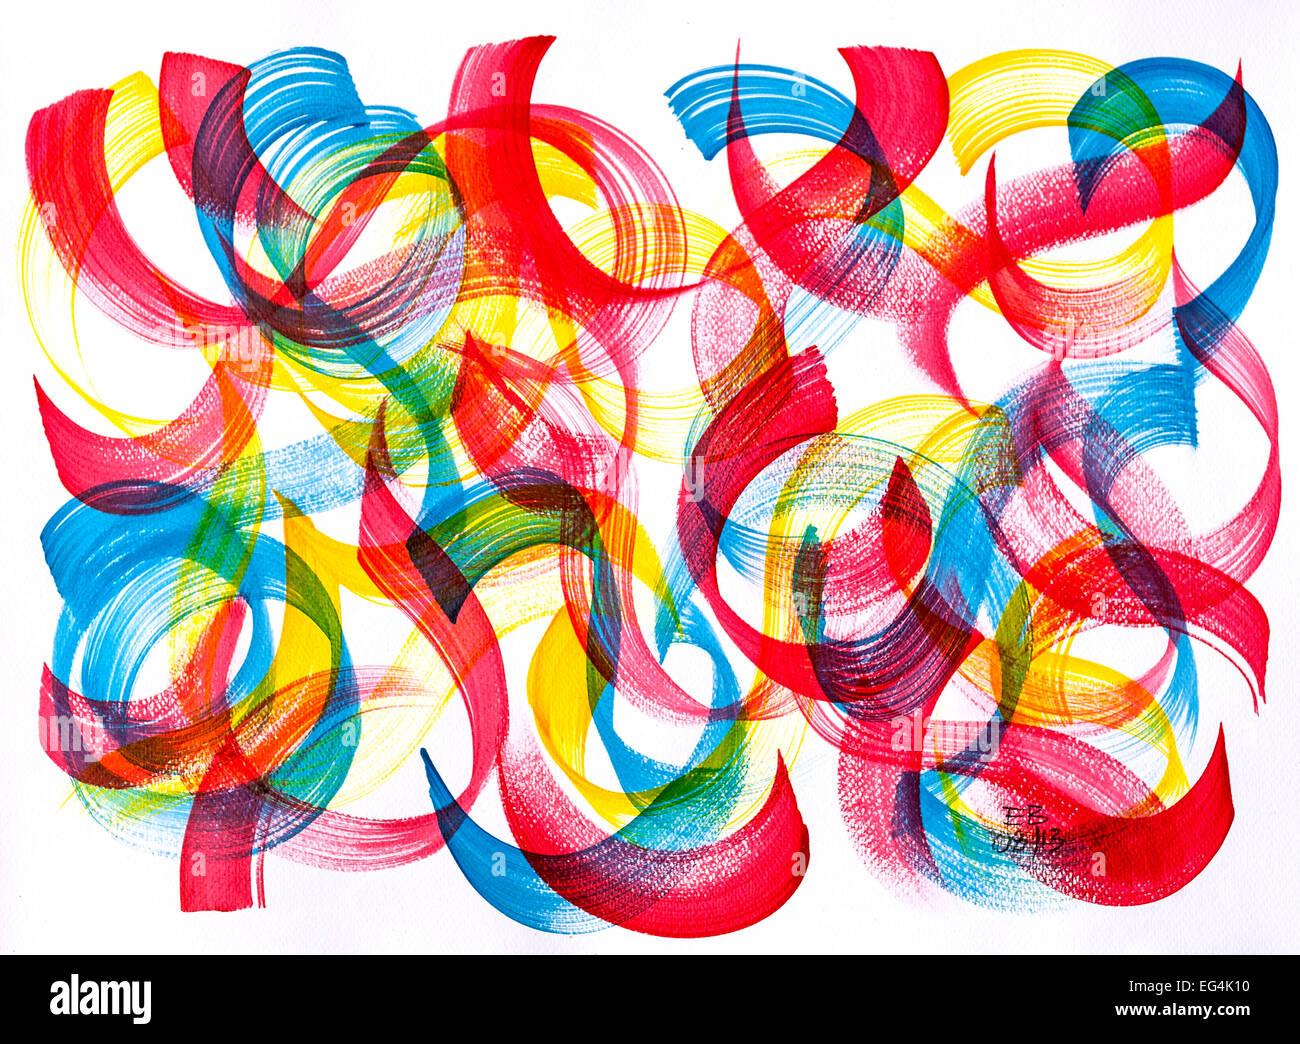 "Acrylic painting ""Eastern Dancers"" by Ed Buziak - France. - Stock Image"